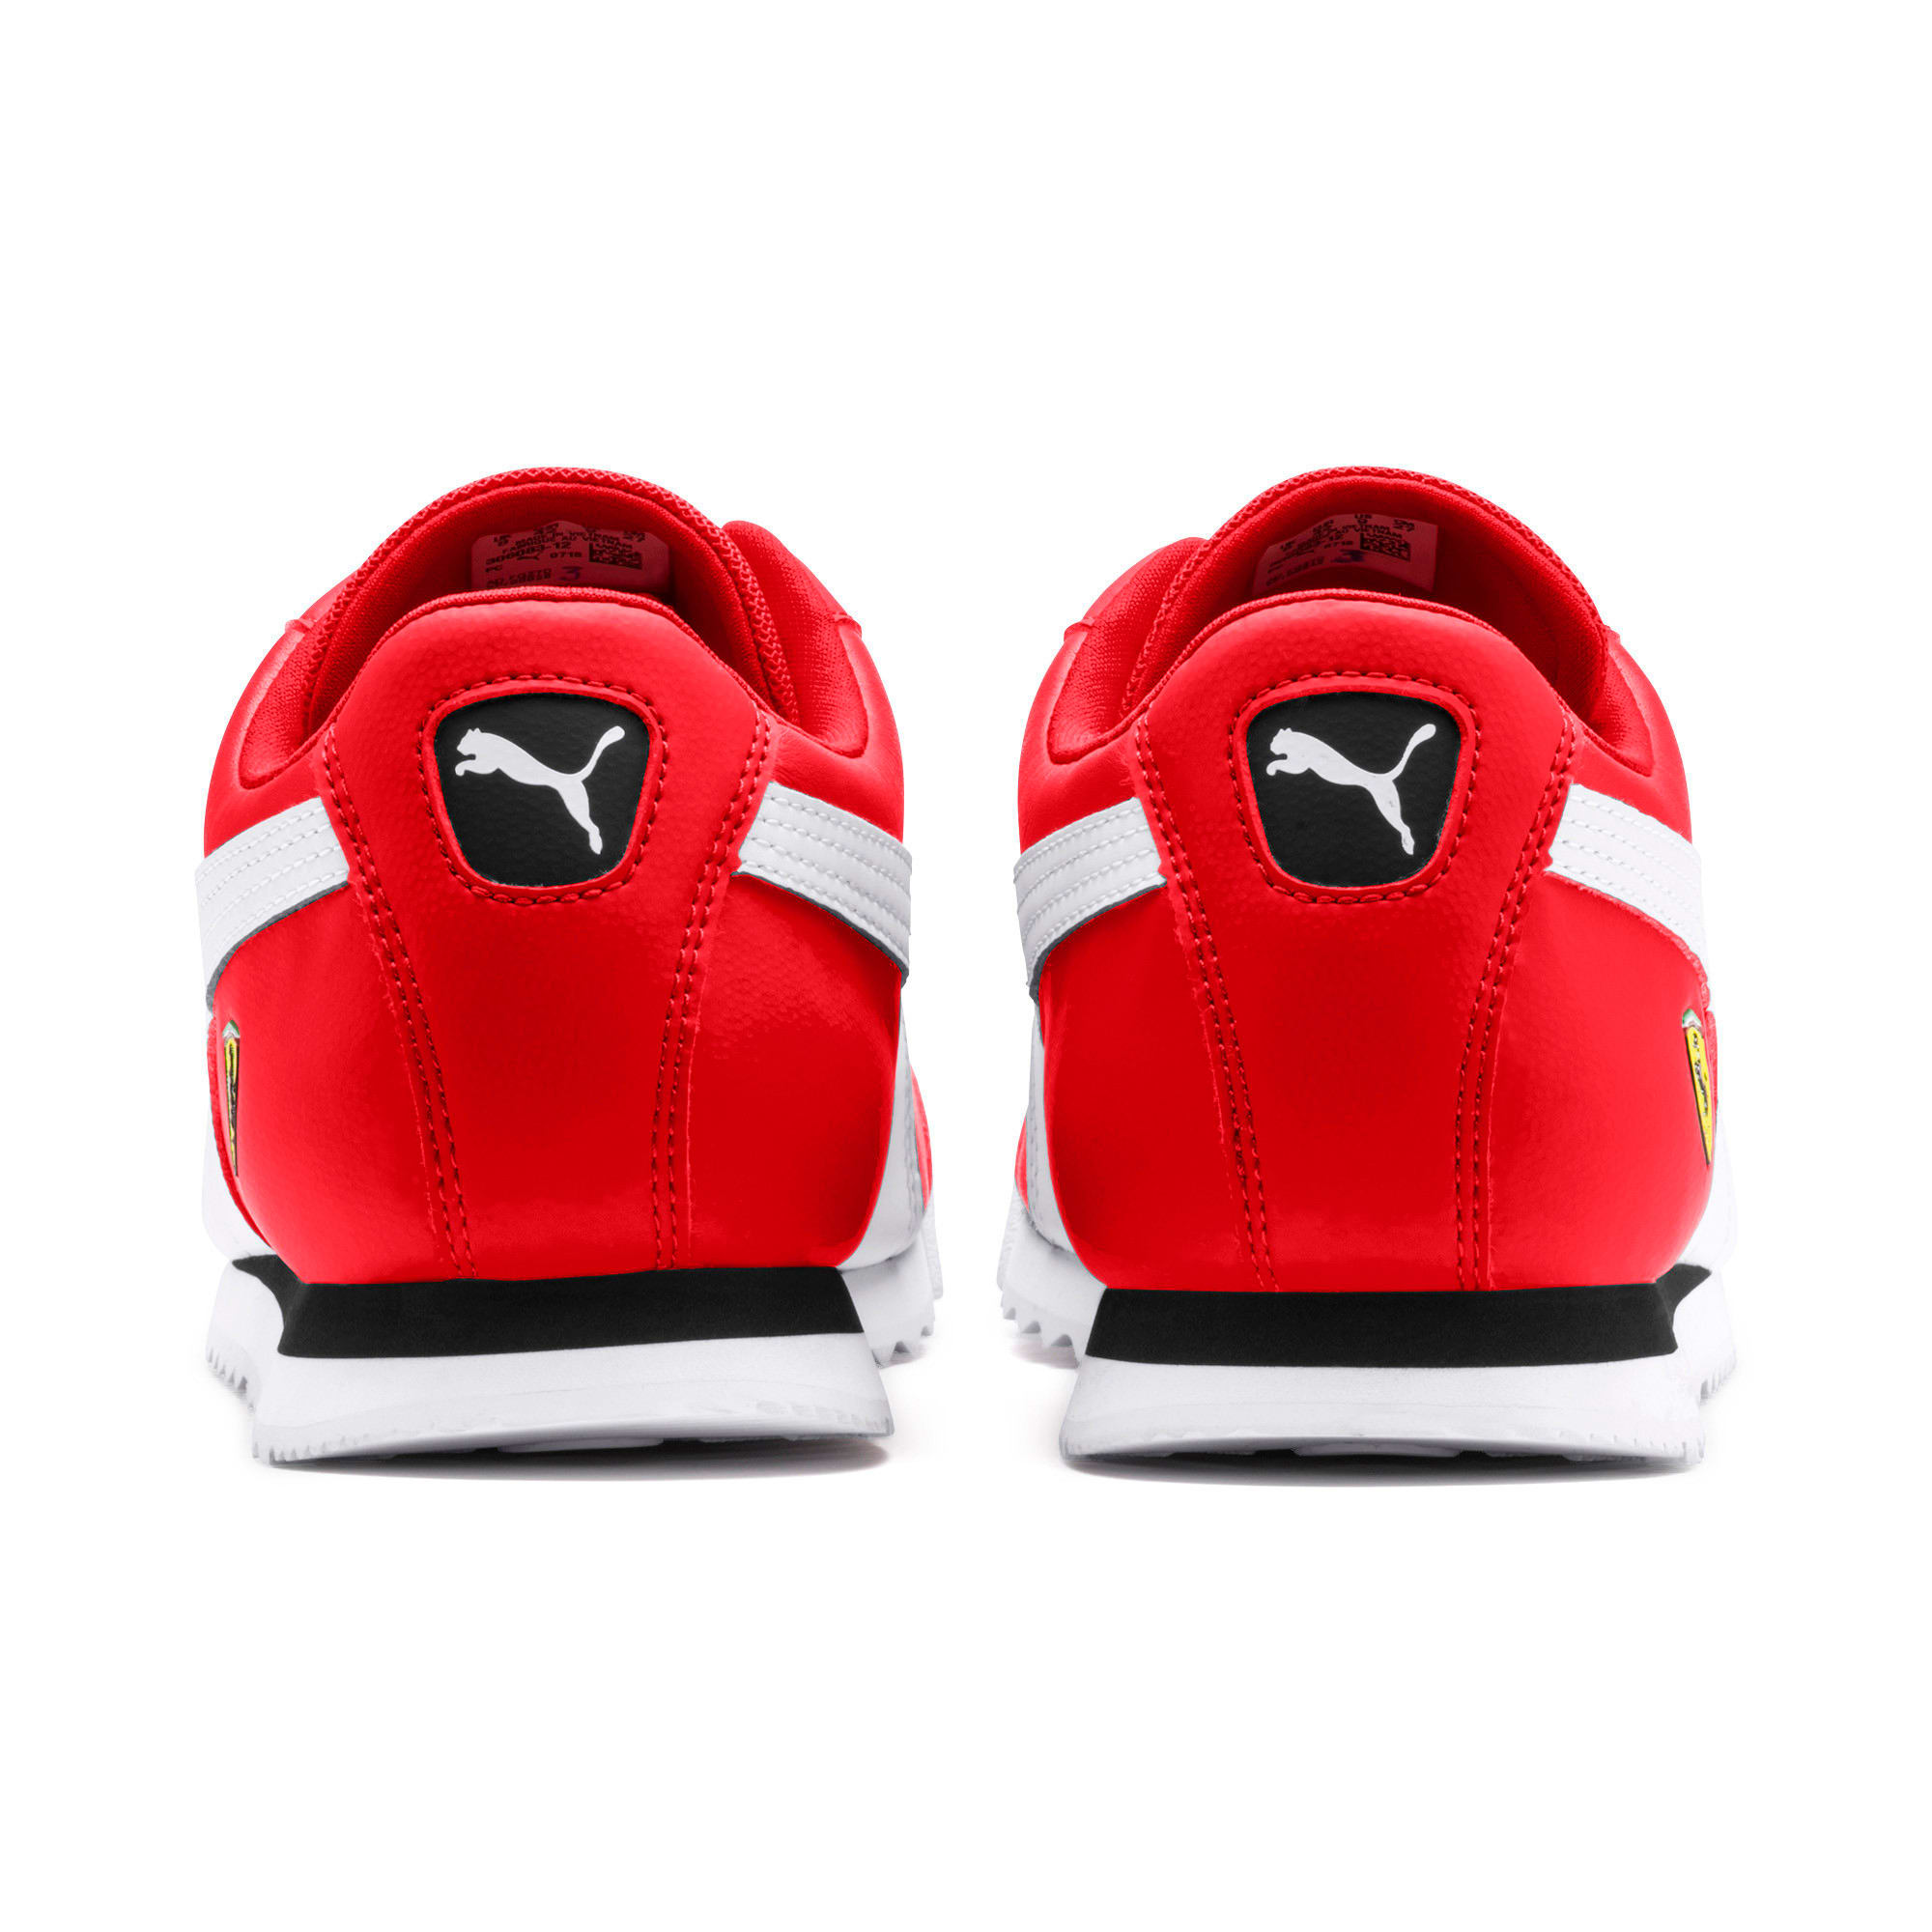 Thumbnail 4 of Scuderia Ferrari Roma Men's Sneakers, Rosso Corsa-White-Black, medium